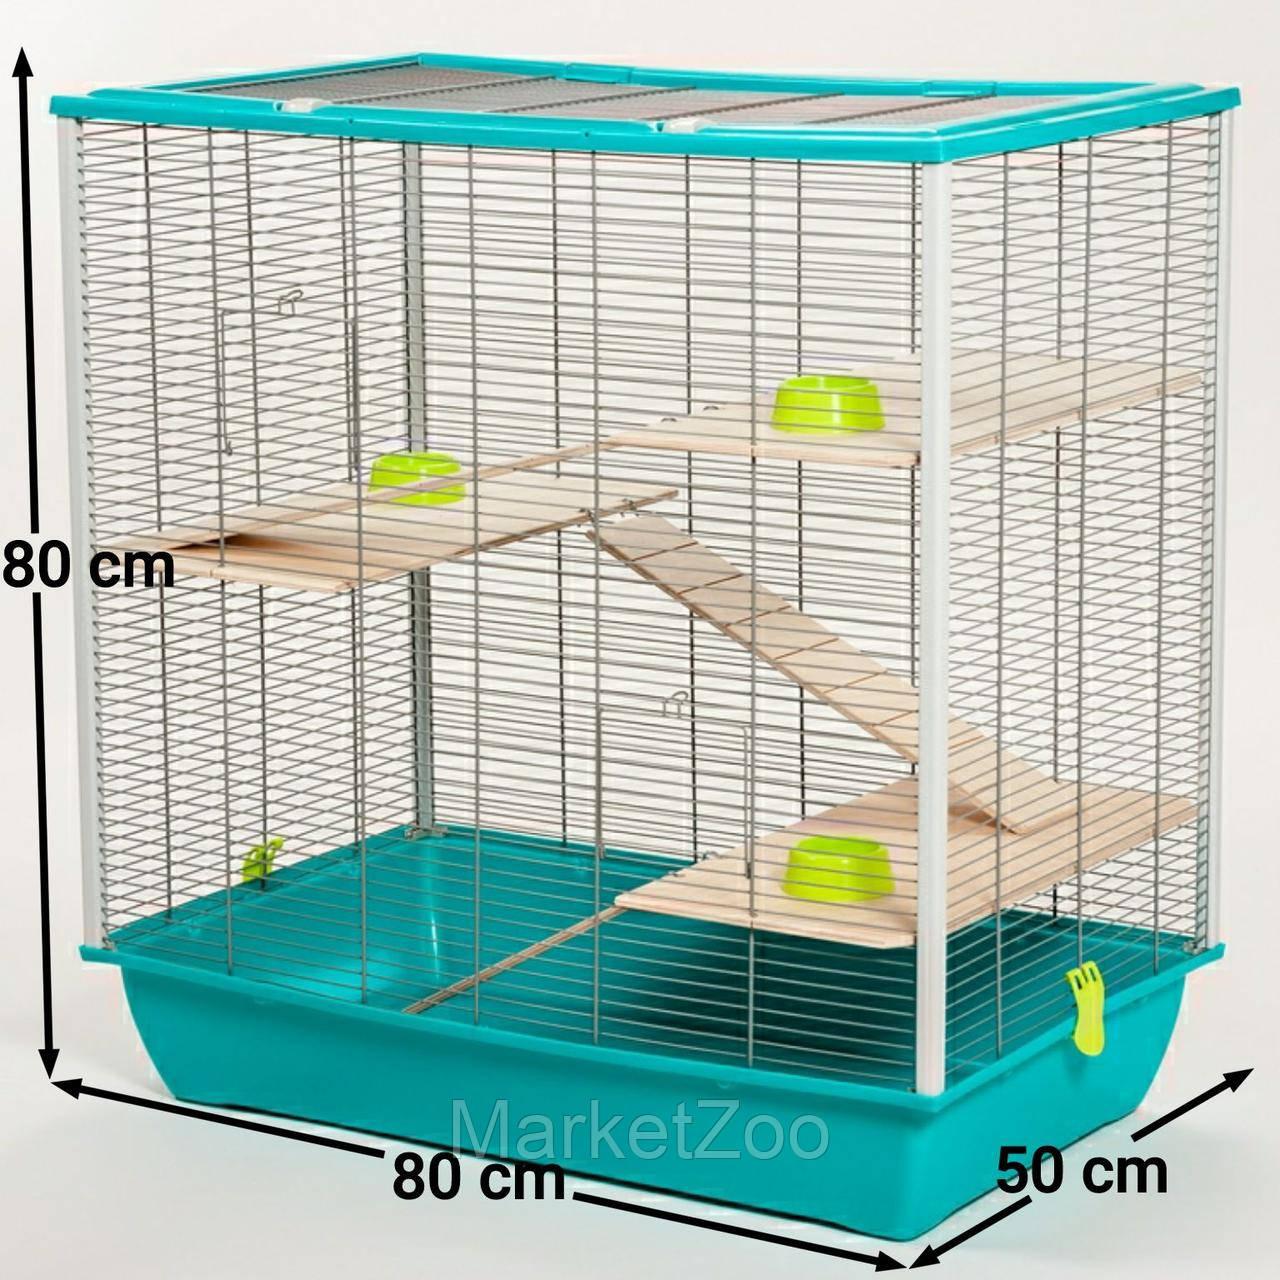 Клетка для шиншилл,белок дегу,крыс,белок летяг.Размер 80×80×50